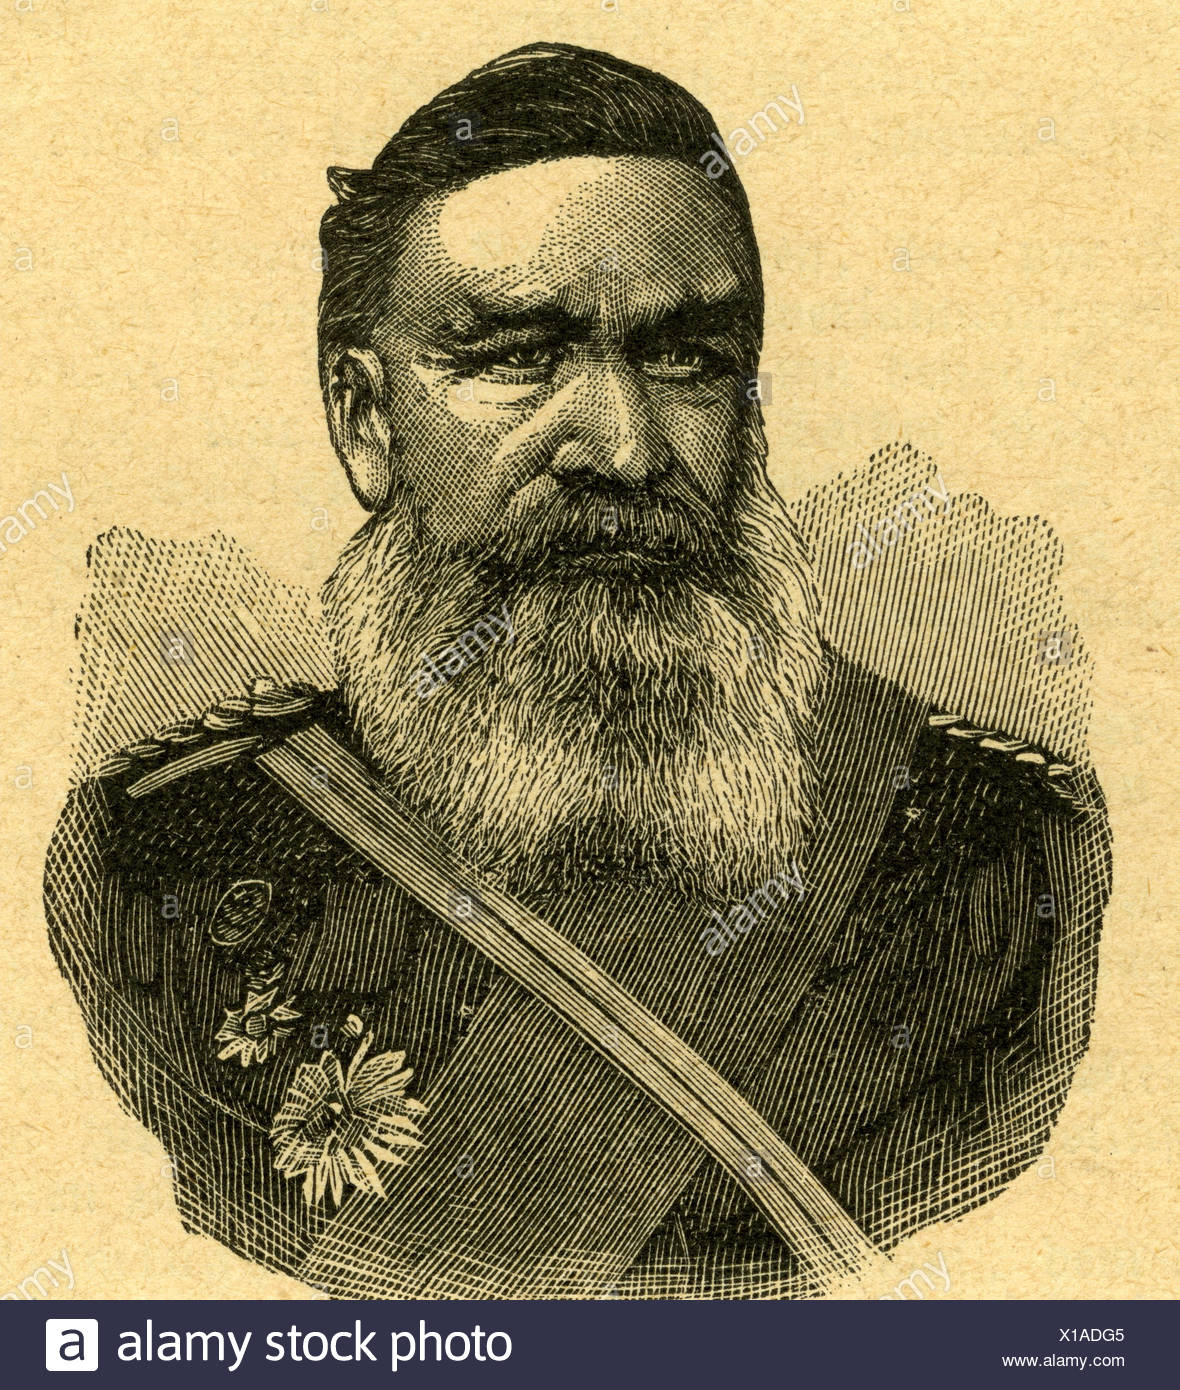 'Joubert, Petrus Jacobus 'Piet', 1834 - 1900, Boer general, portrait, engraving, 19th century, Boer War 1899 - 1902, commandan - Stock Image